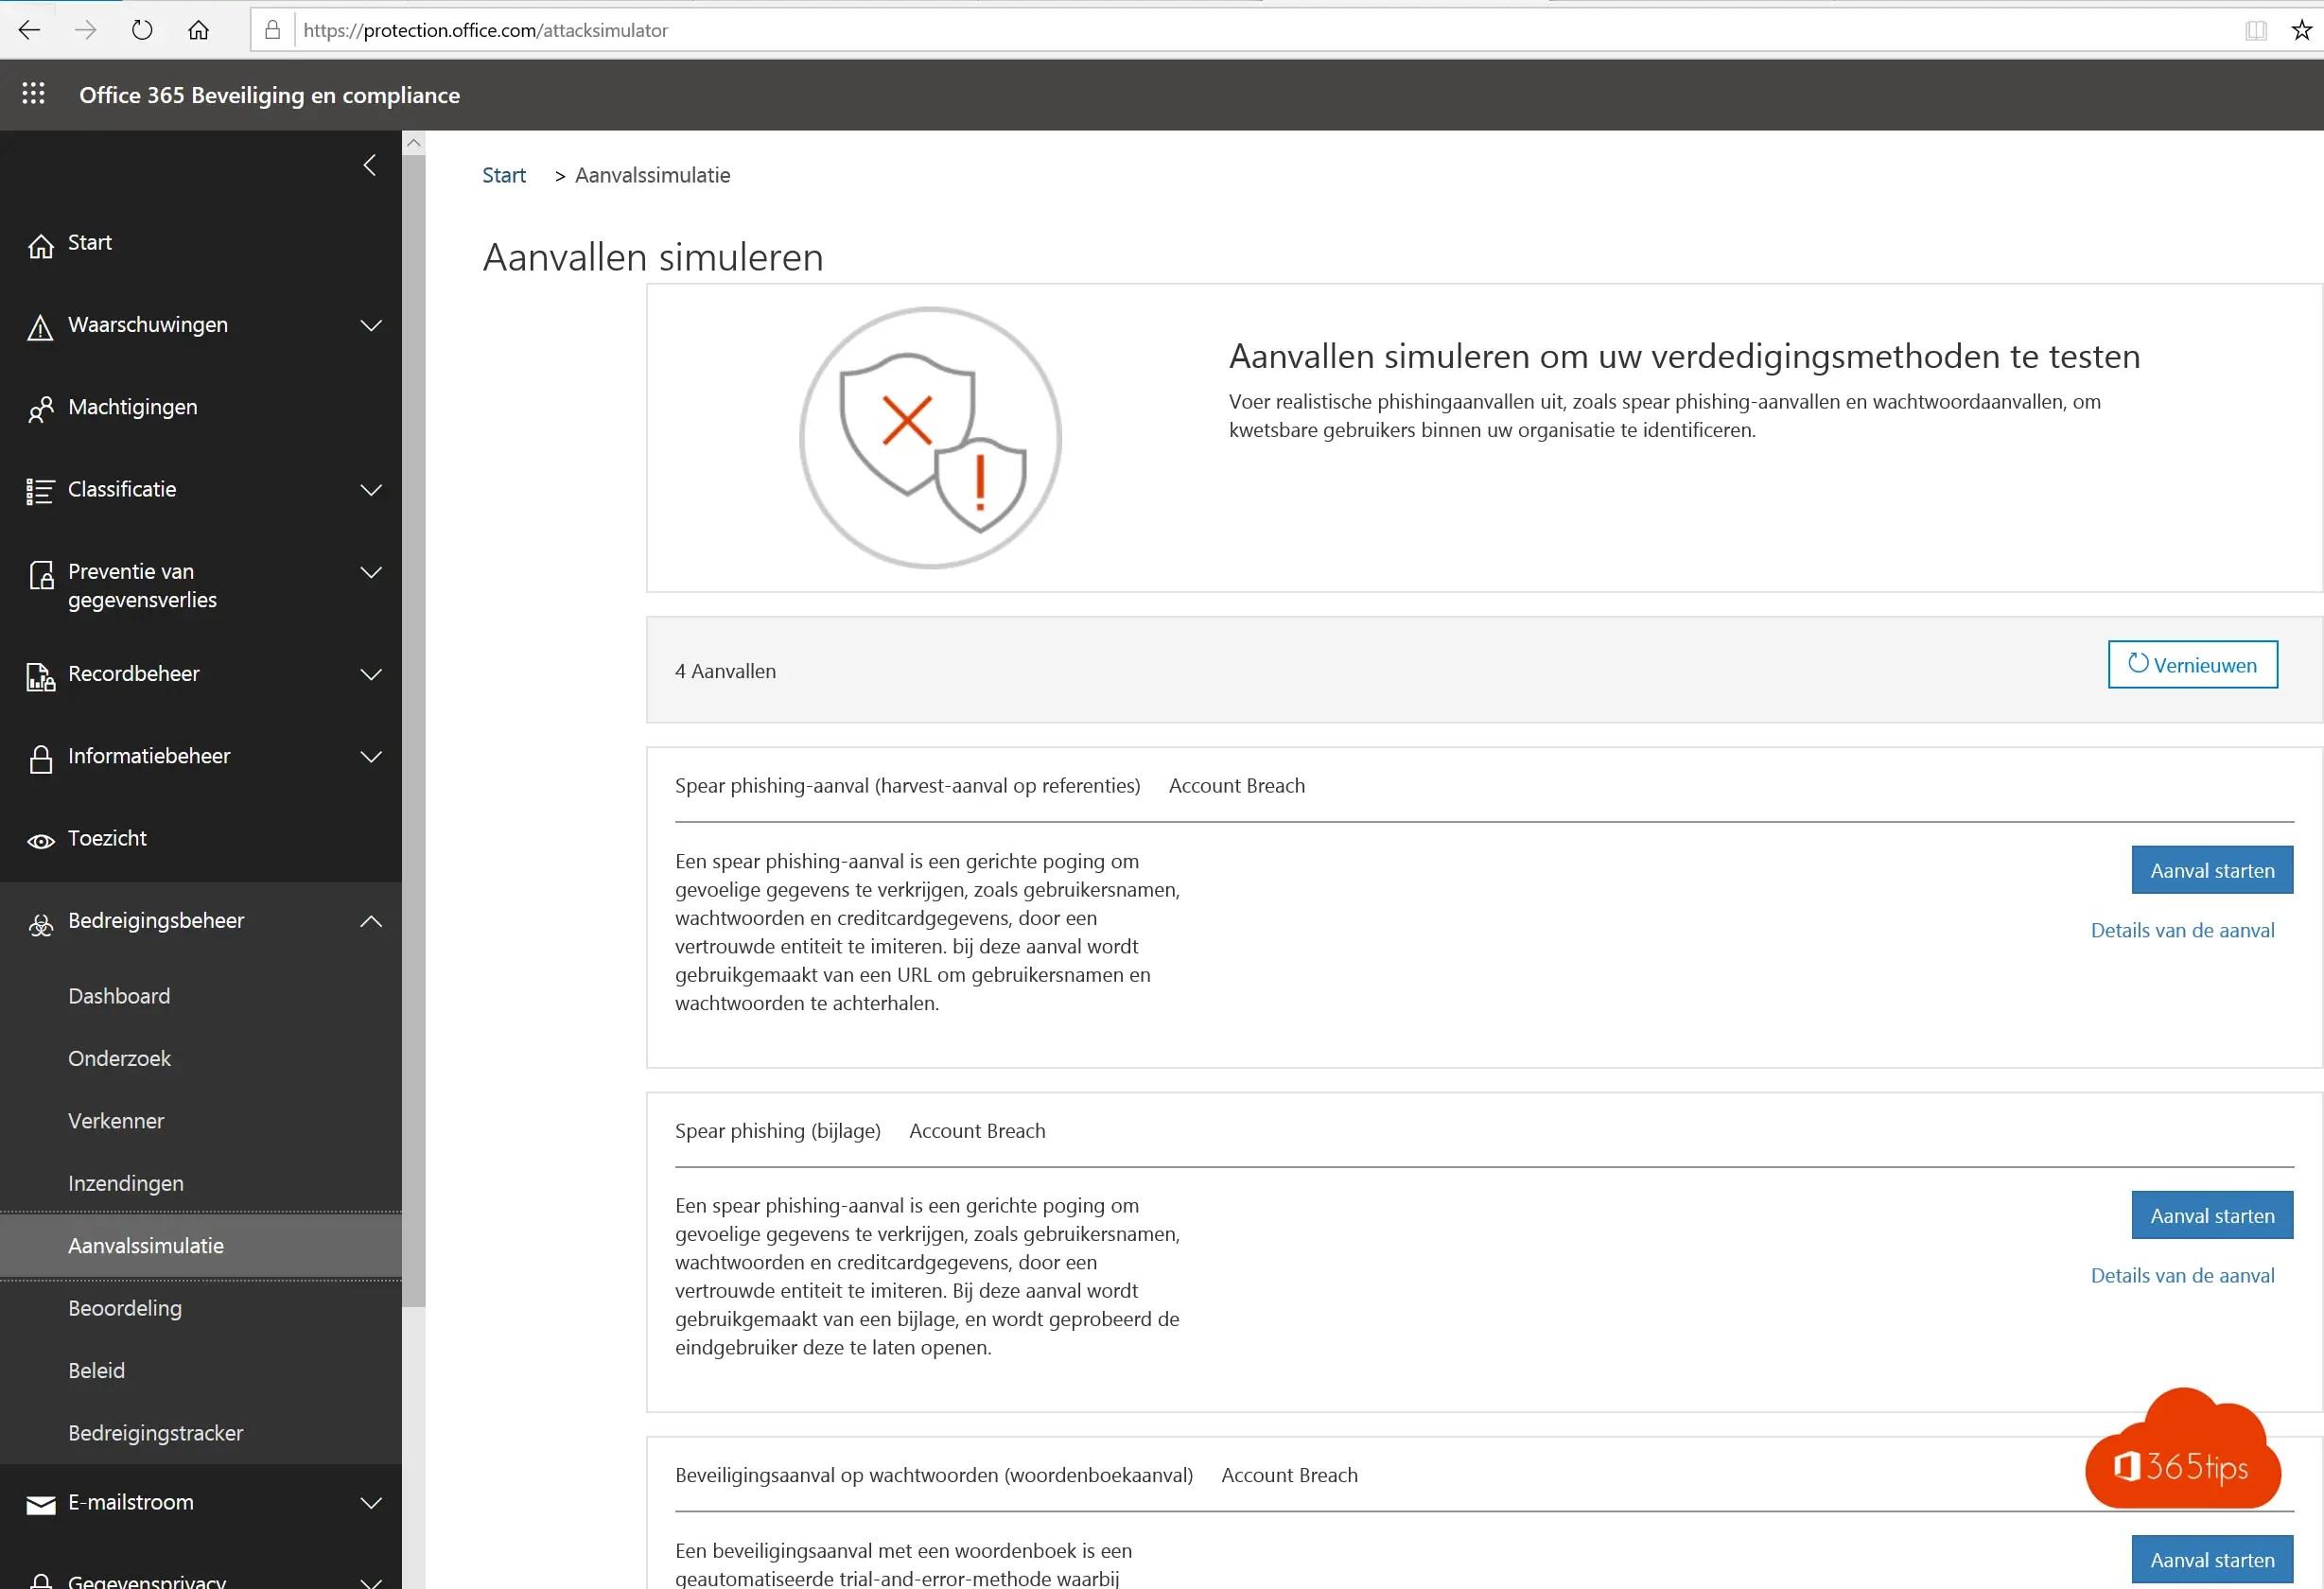 Attack Simulator in Office 365